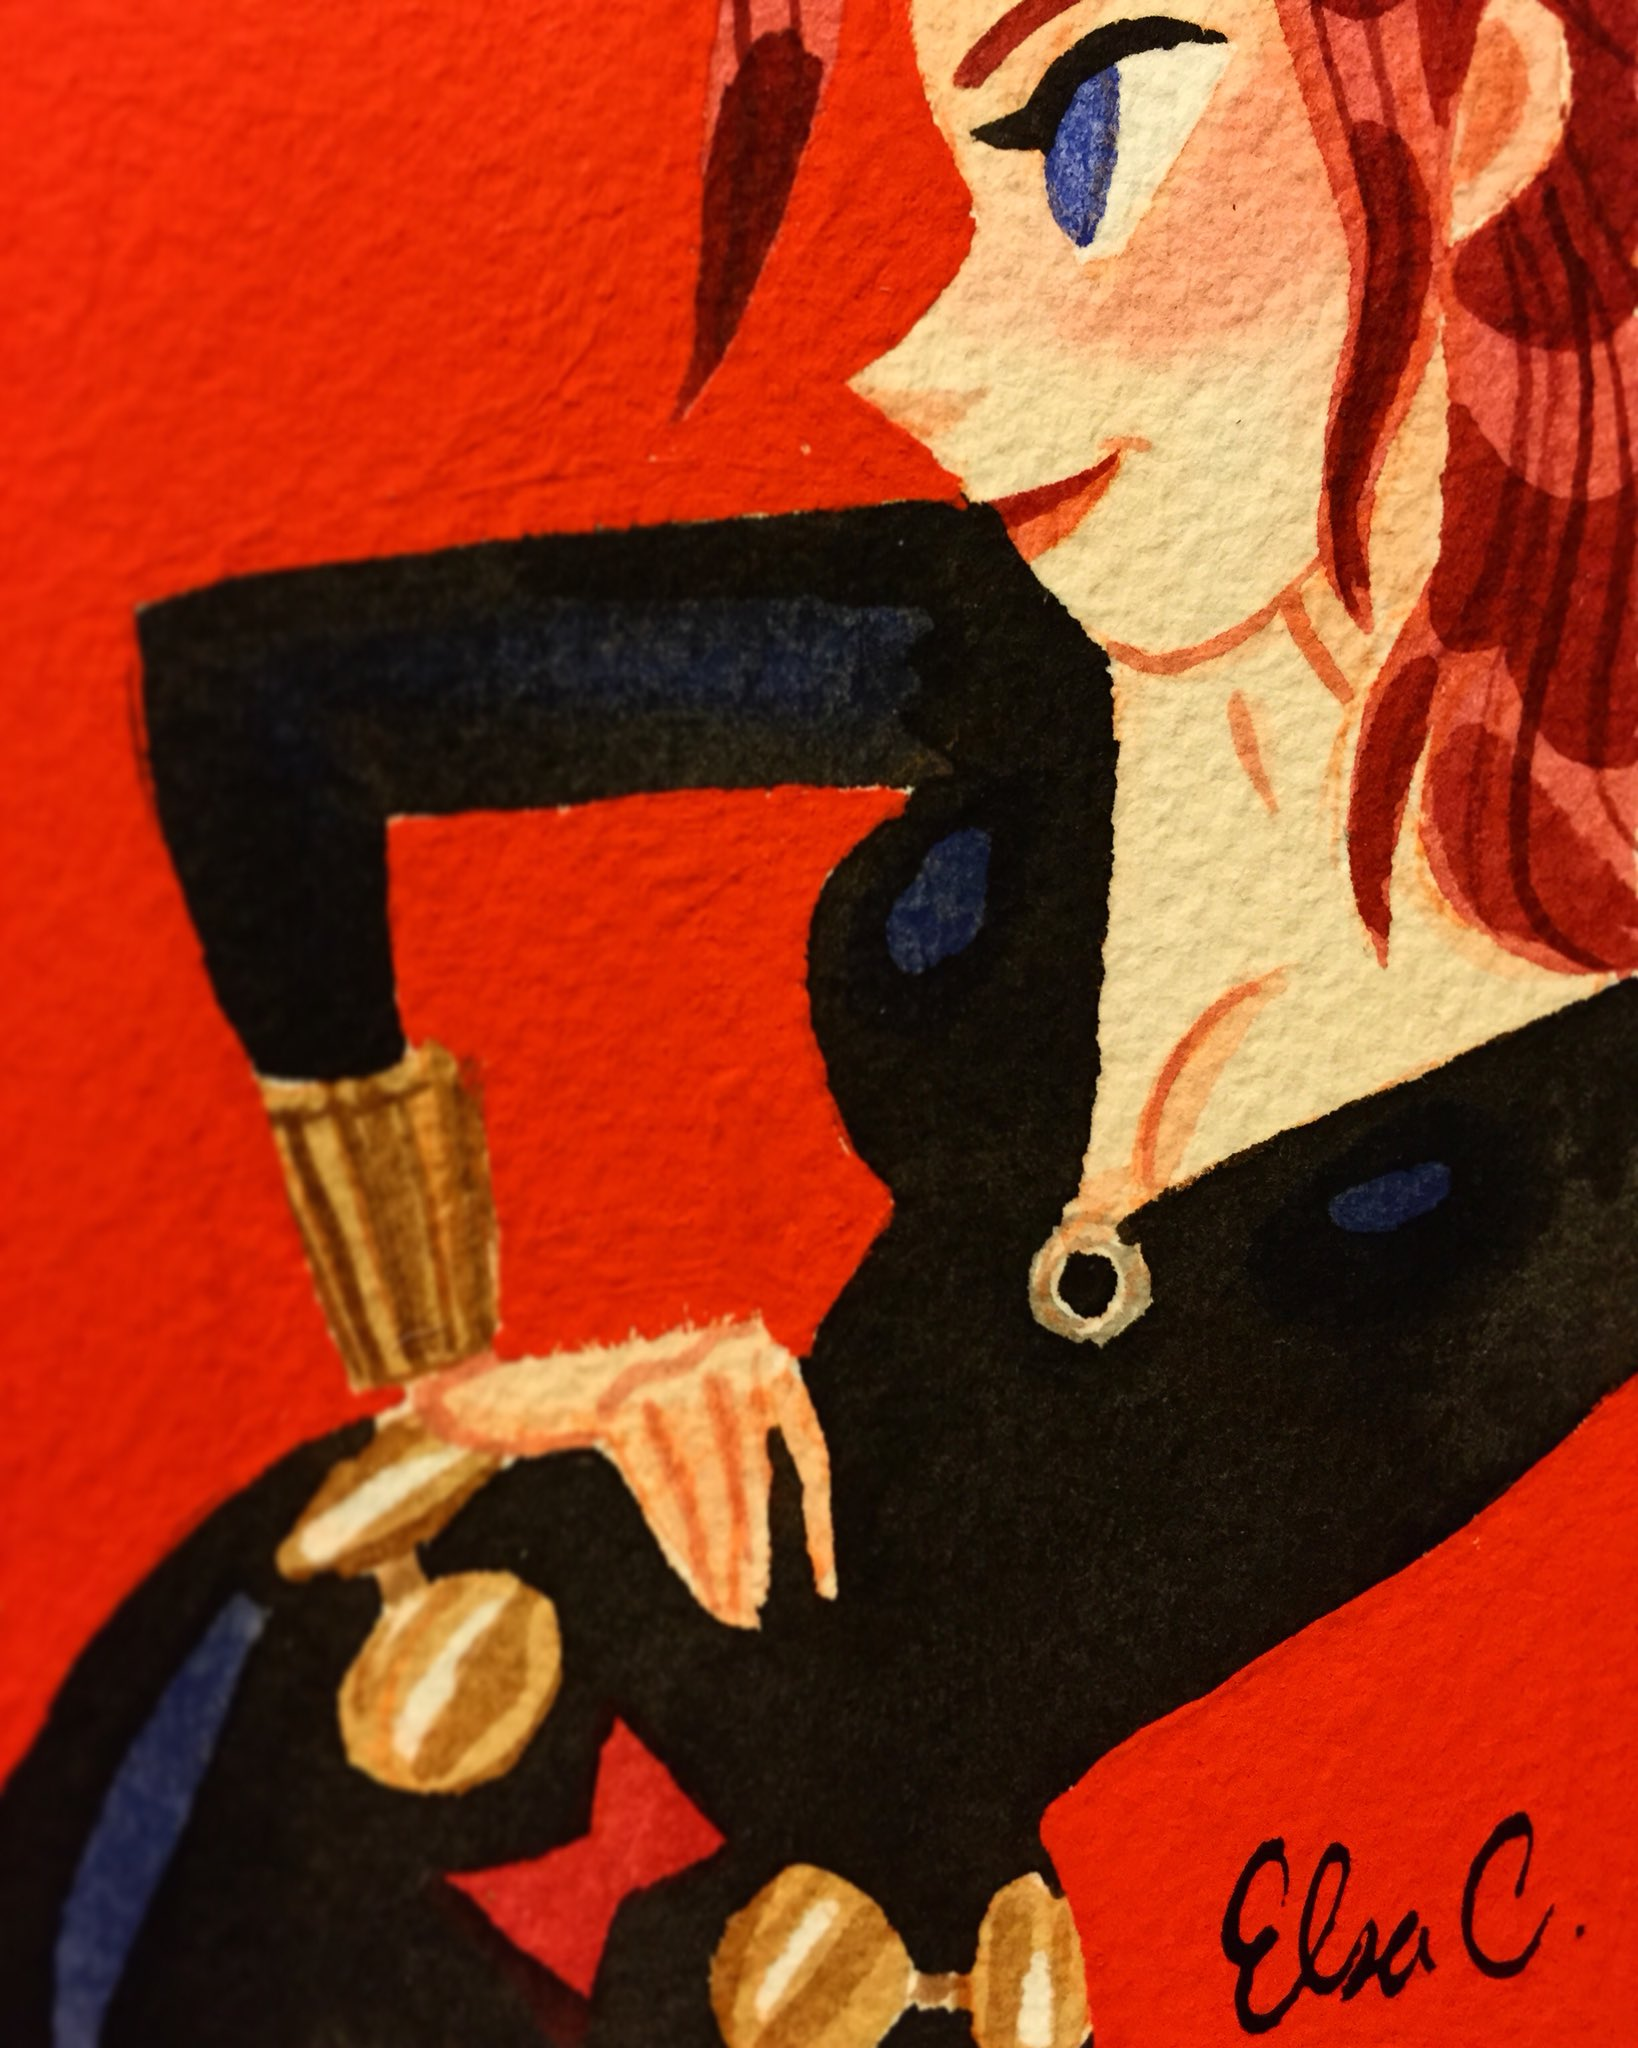 Black Widow #gouache #watercolor https://t.co/cZI3GuDTK3